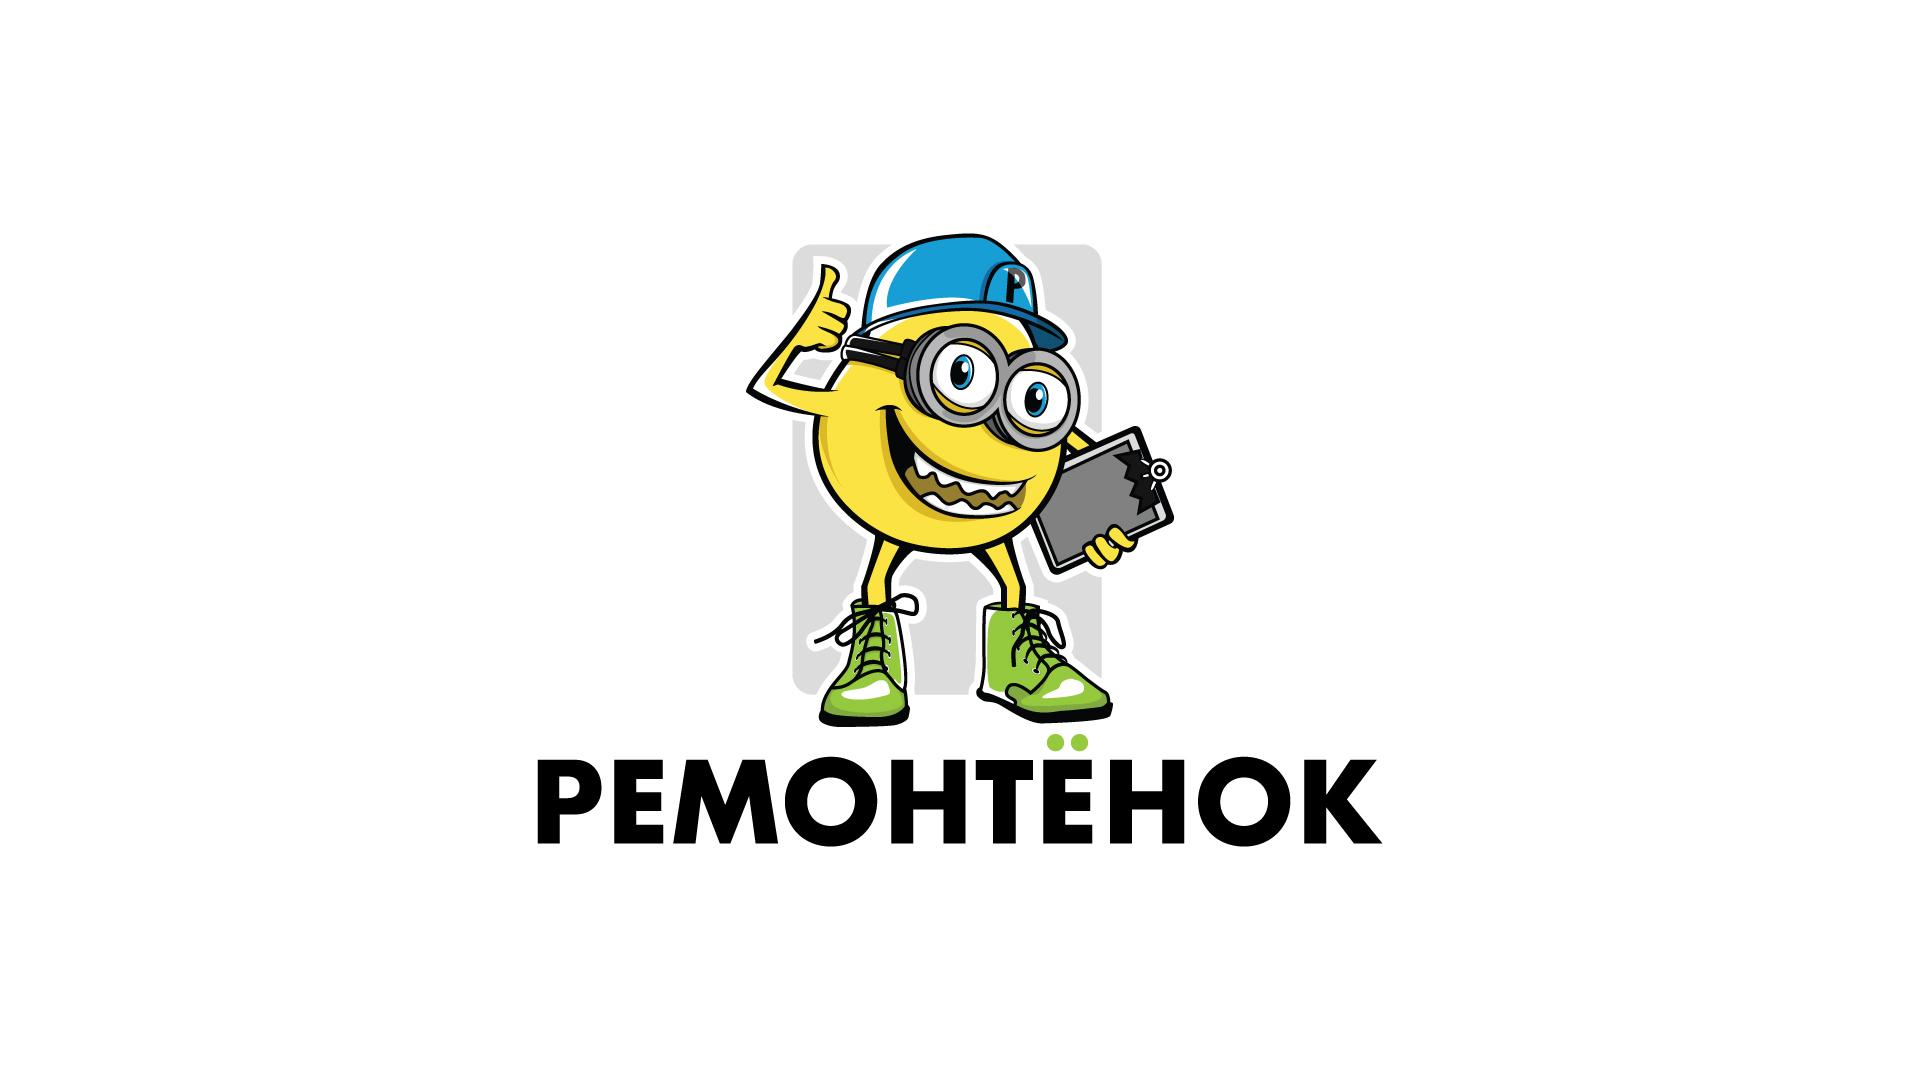 Ремонтёнок: логотип + брэндбук + фирменный стиль фото f_4365958e81b58be6.jpg